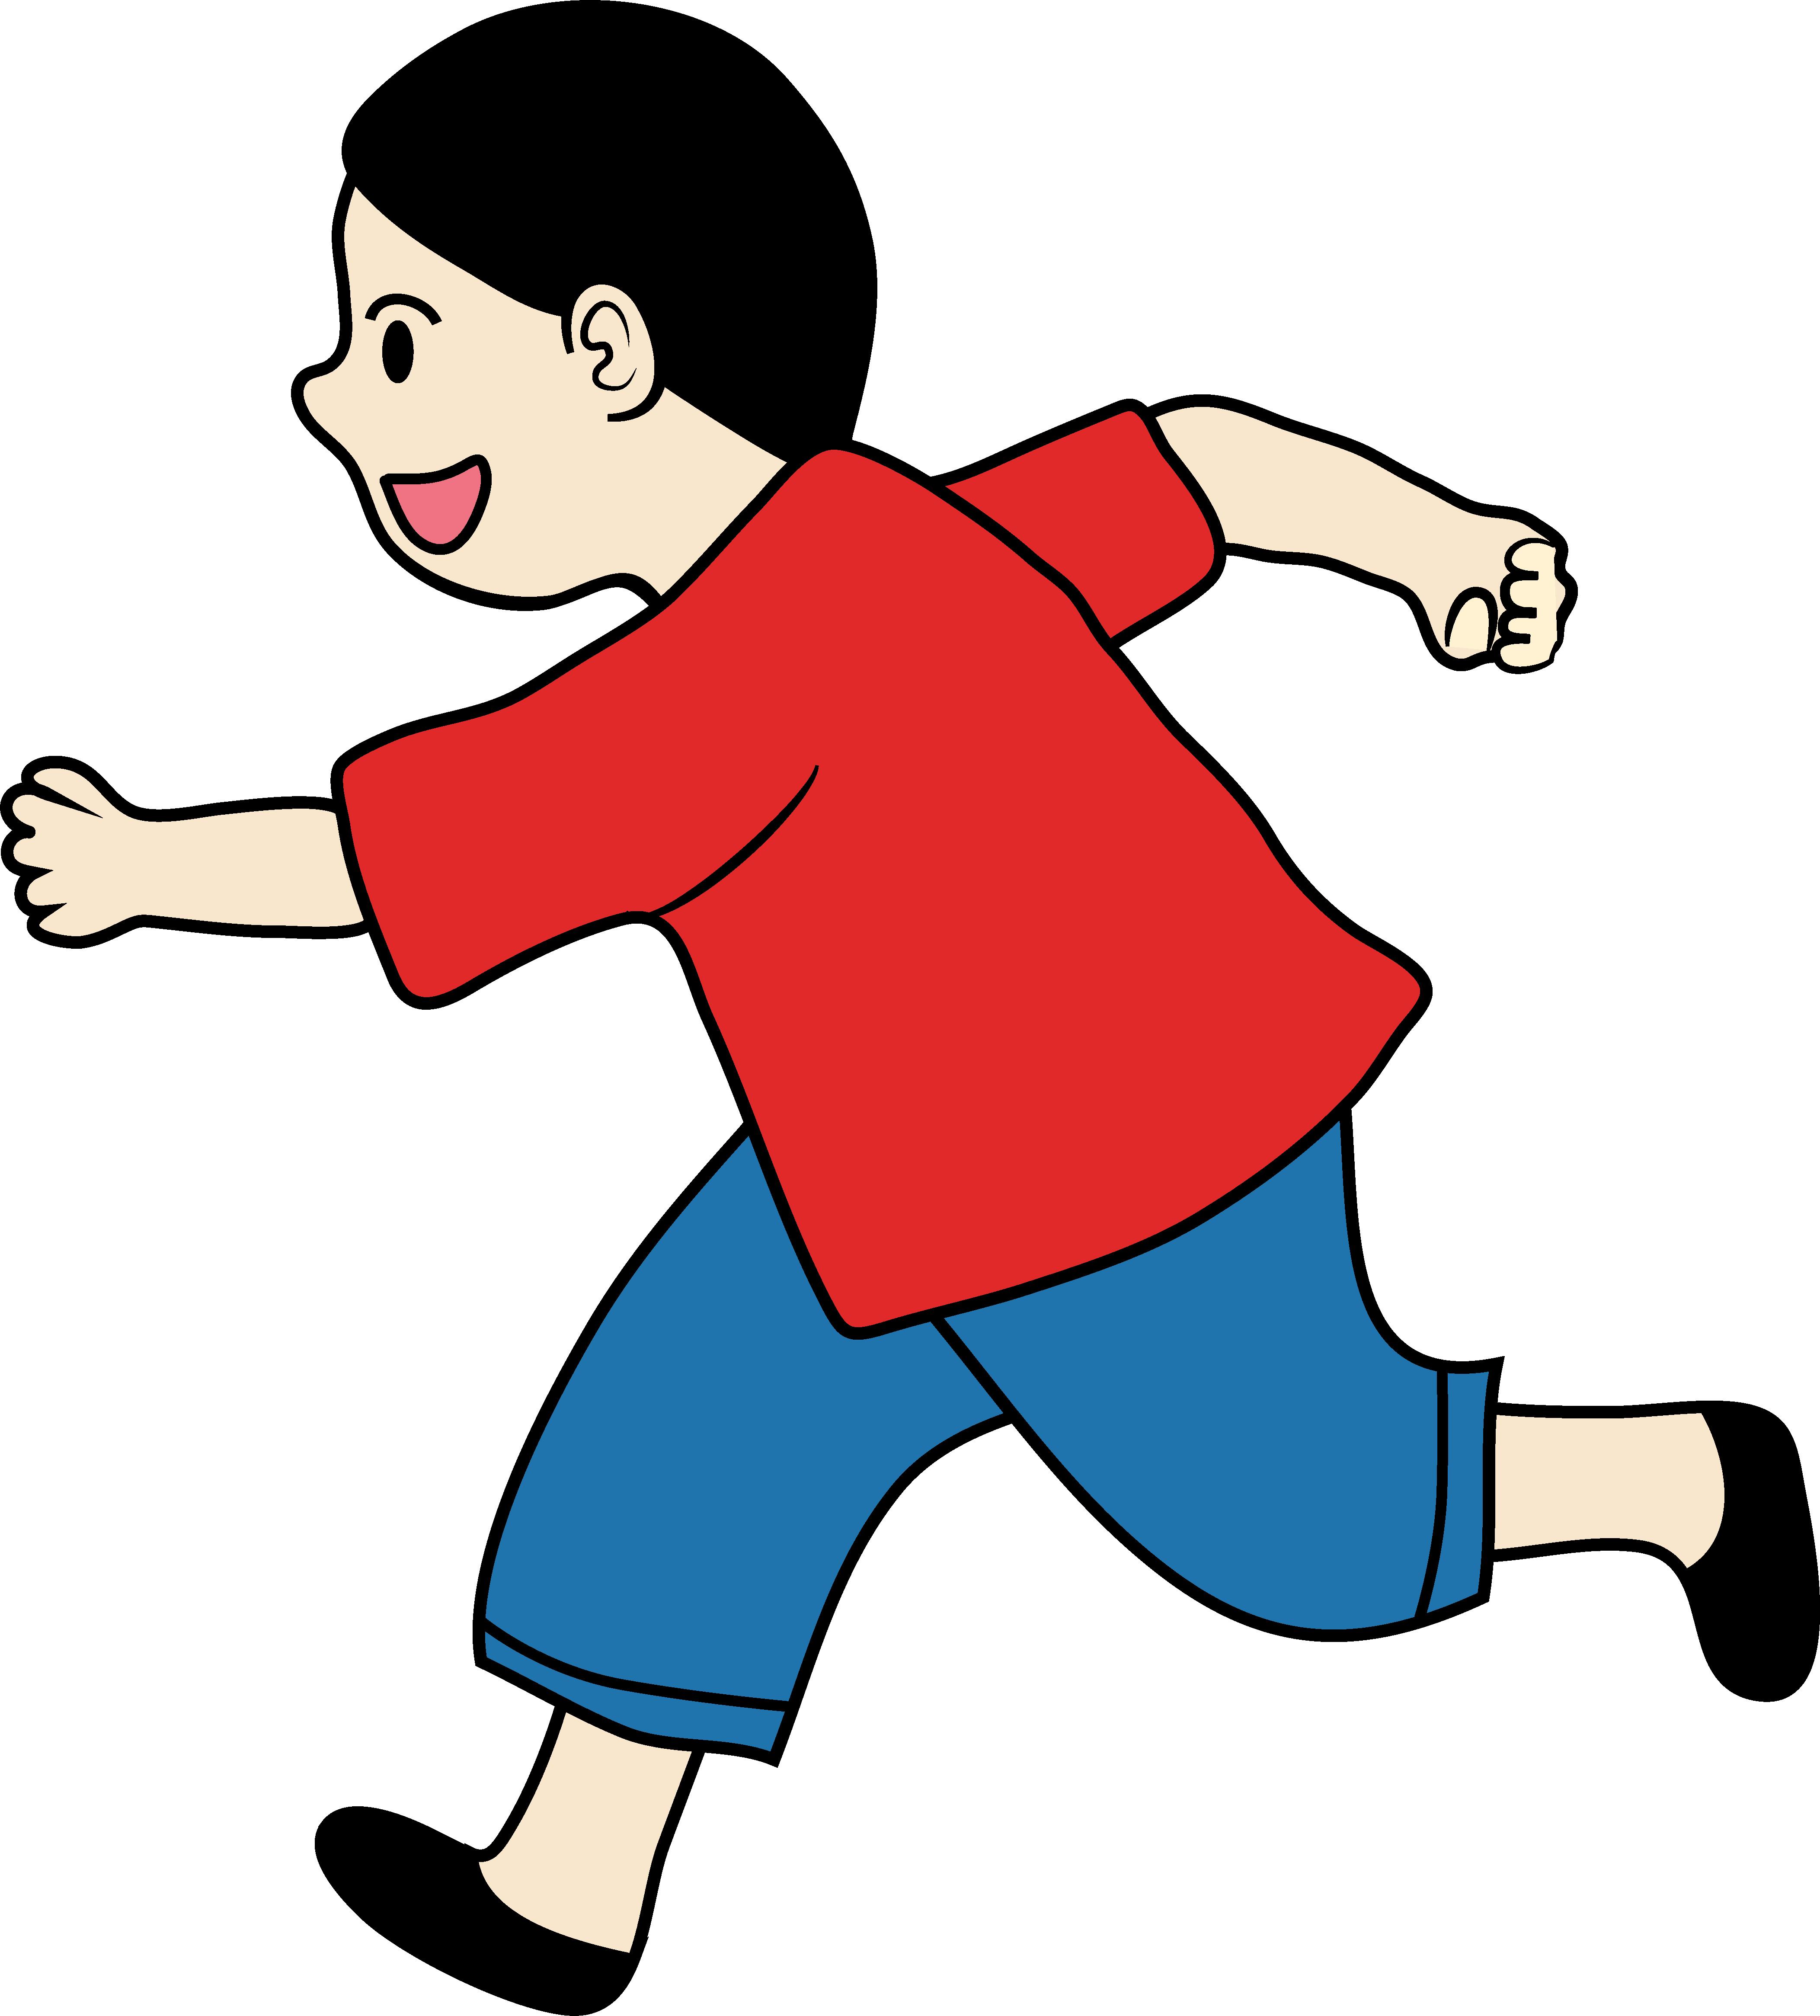 4209x4662 School Kids Cartoon Png Clipartfest Mario Bros Christmas Coloring